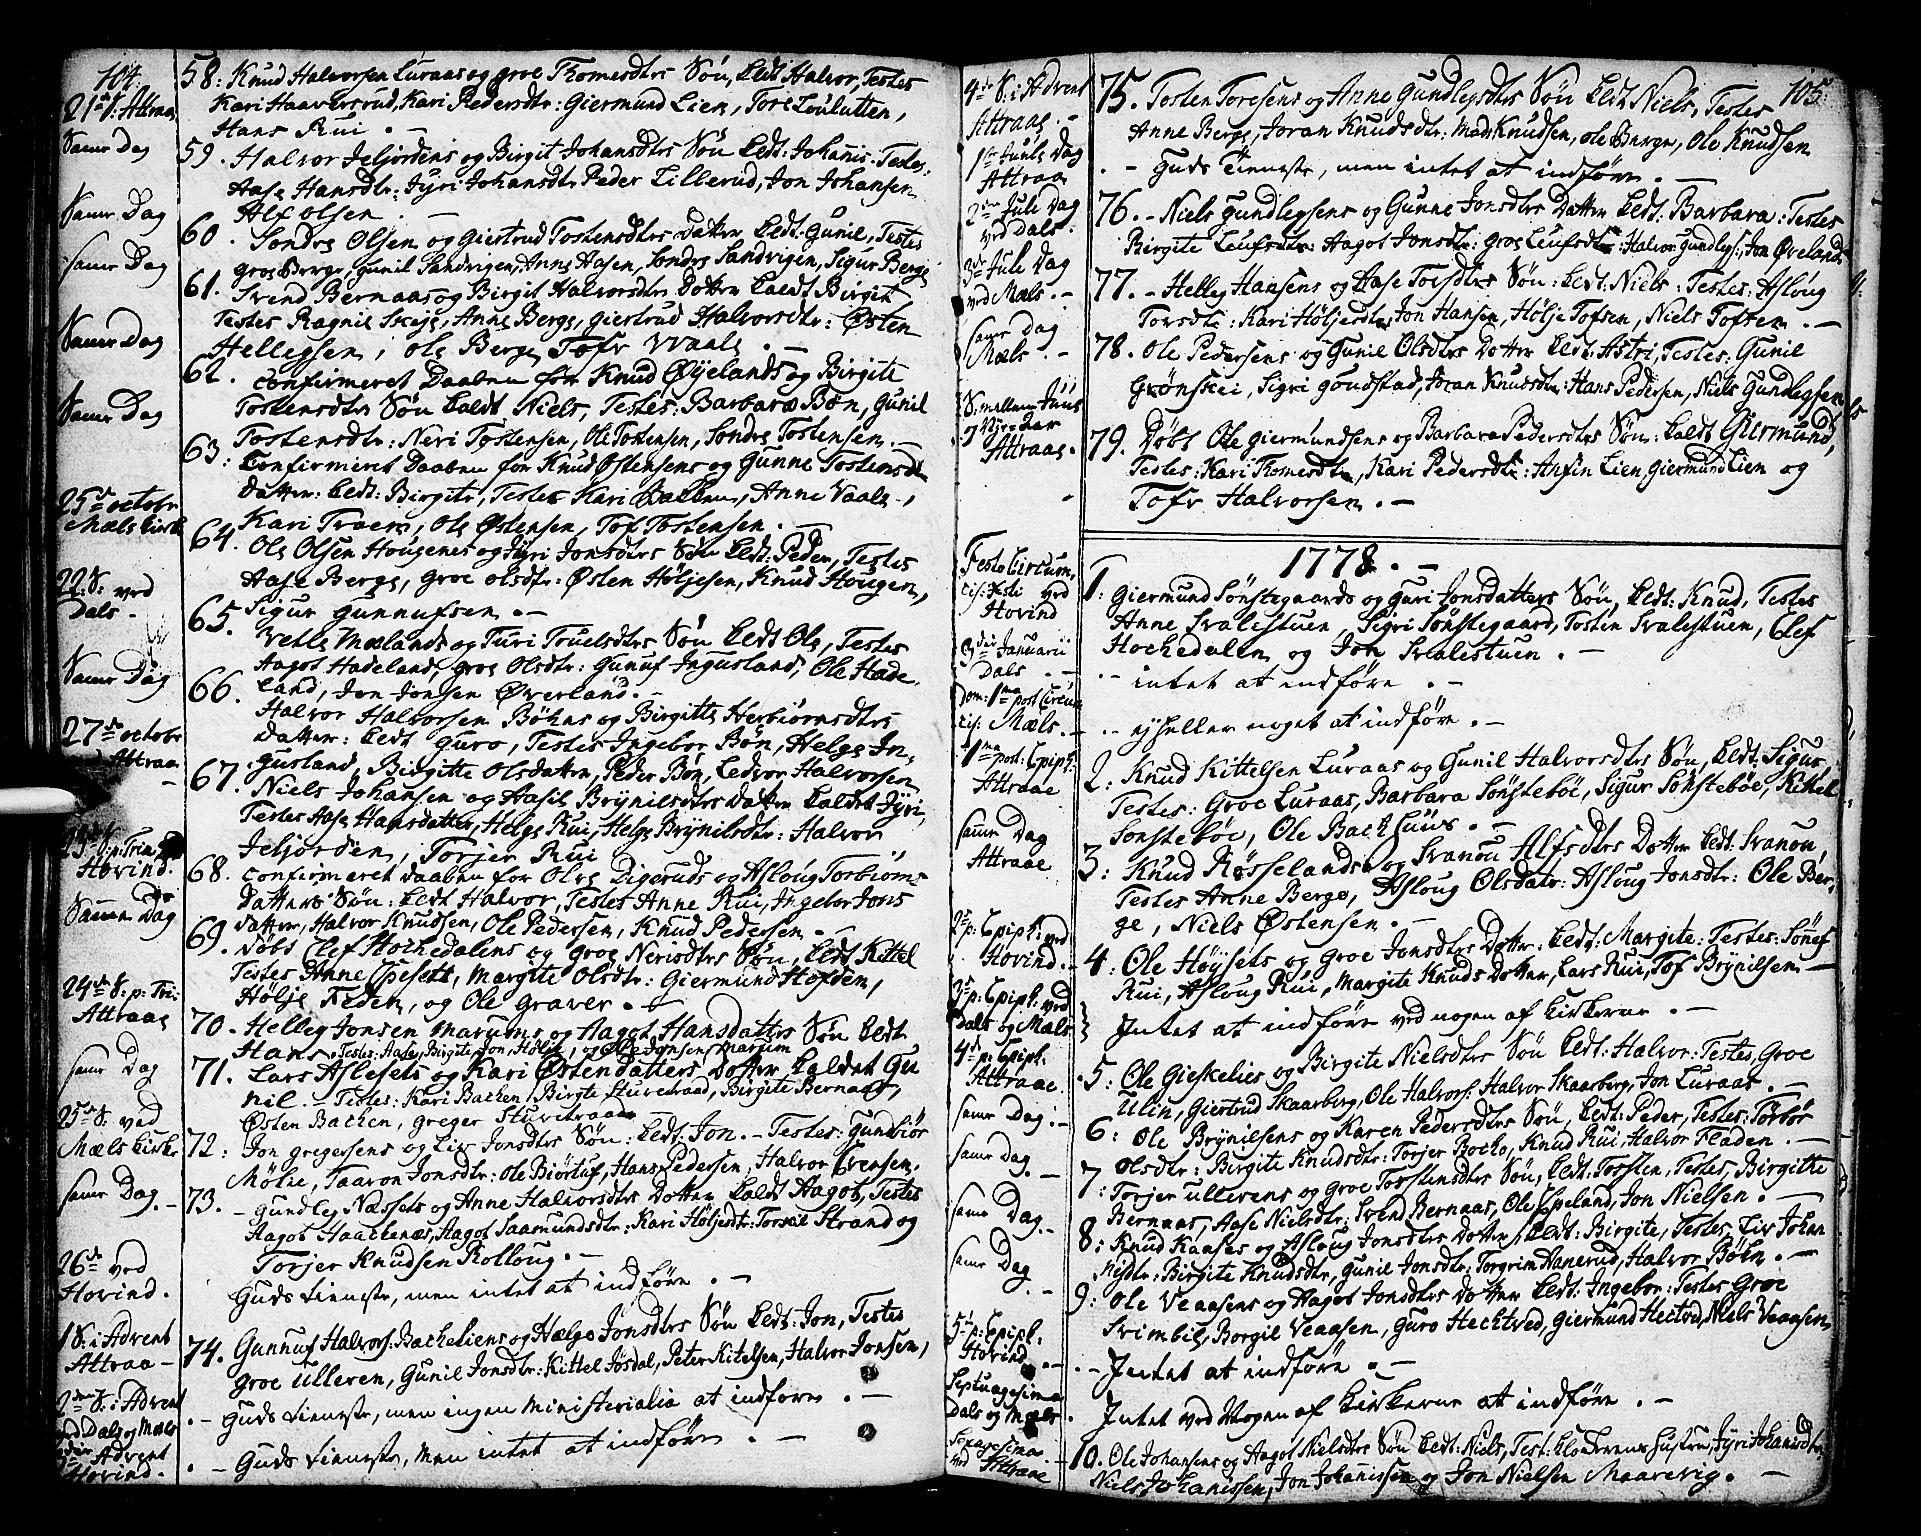 SAKO, Tinn kirkebøker, F/Fa/L0002: Ministerialbok nr. I 2, 1757-1810, s. 104-105